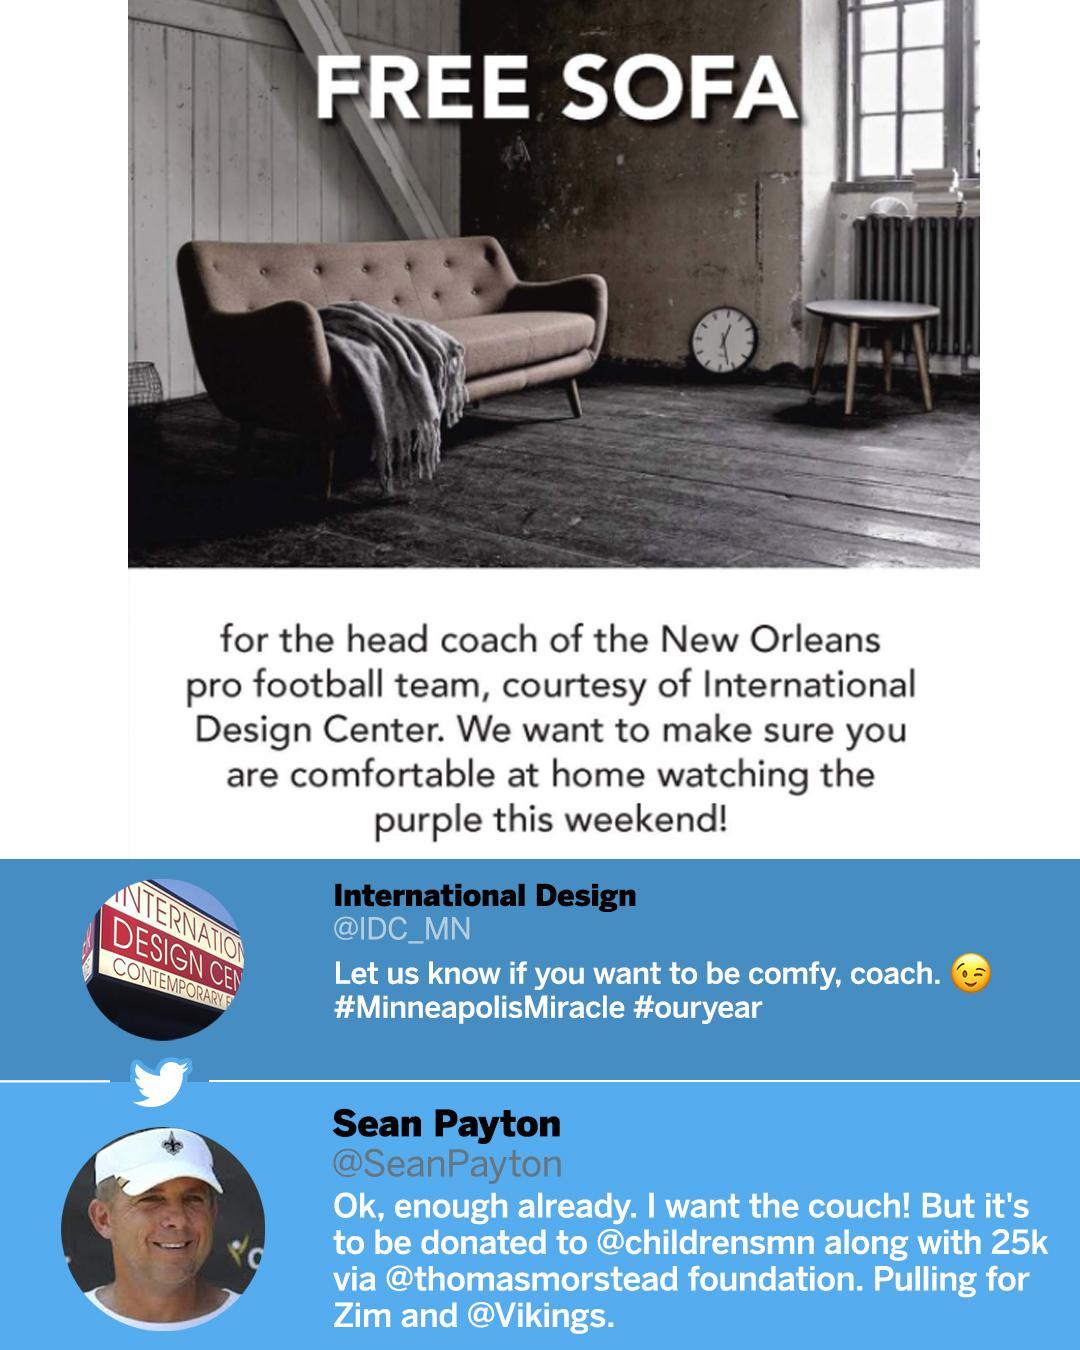 Keep offering Sean Payton free stuff. https://t.co/SjpPdHnVnY